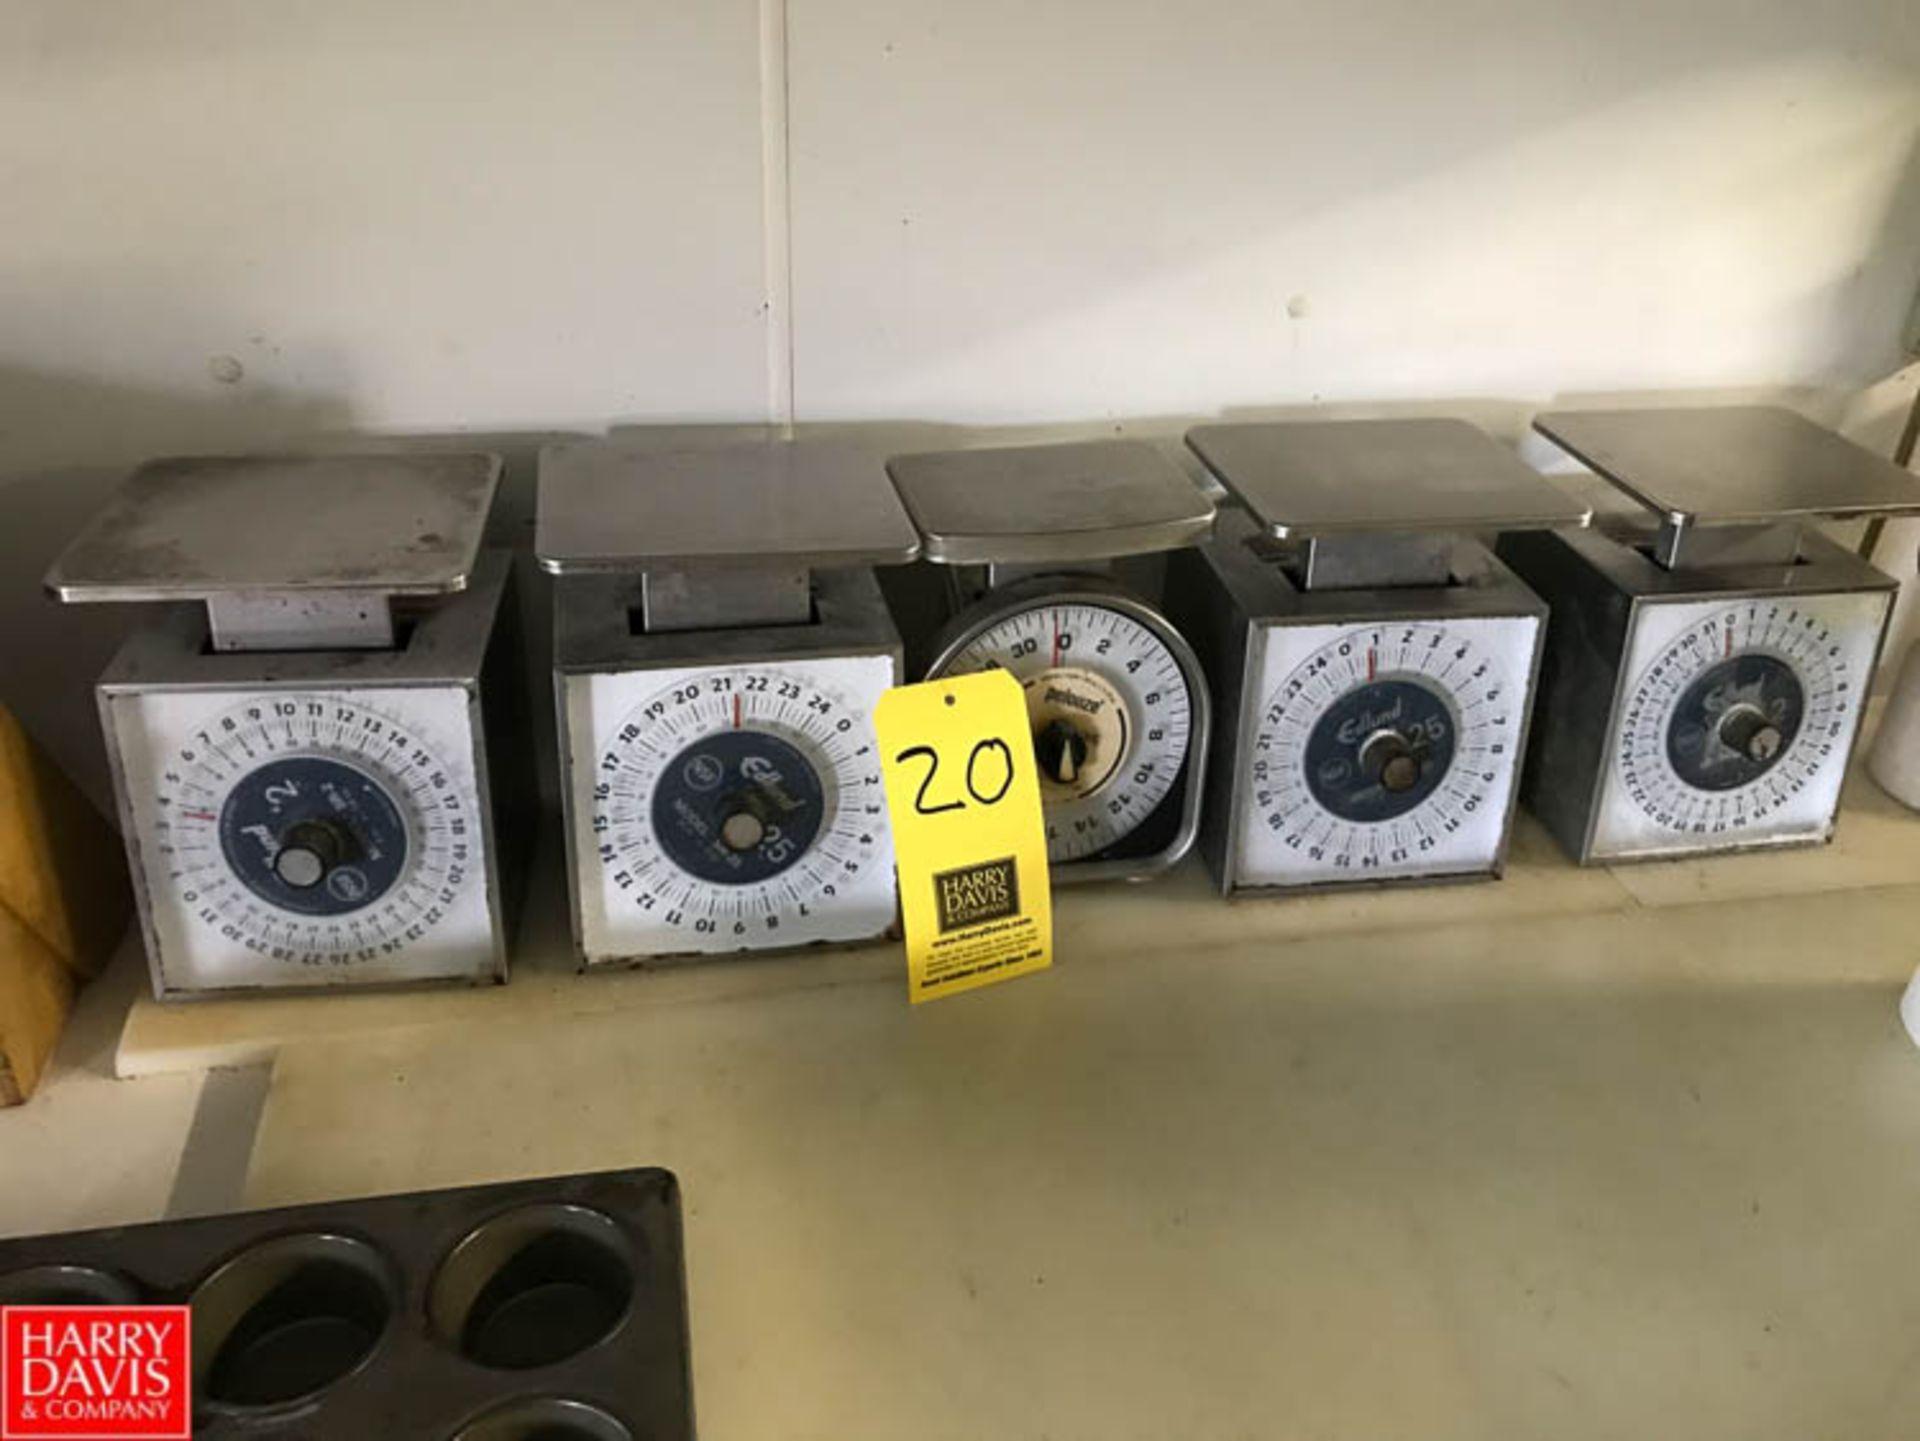 Lot 20 - (2) Edlund 2 LB Capacity, (2) Edlund 25 LB Capacity and (1) Pelouze 2 LB Capacity Scales Rigging